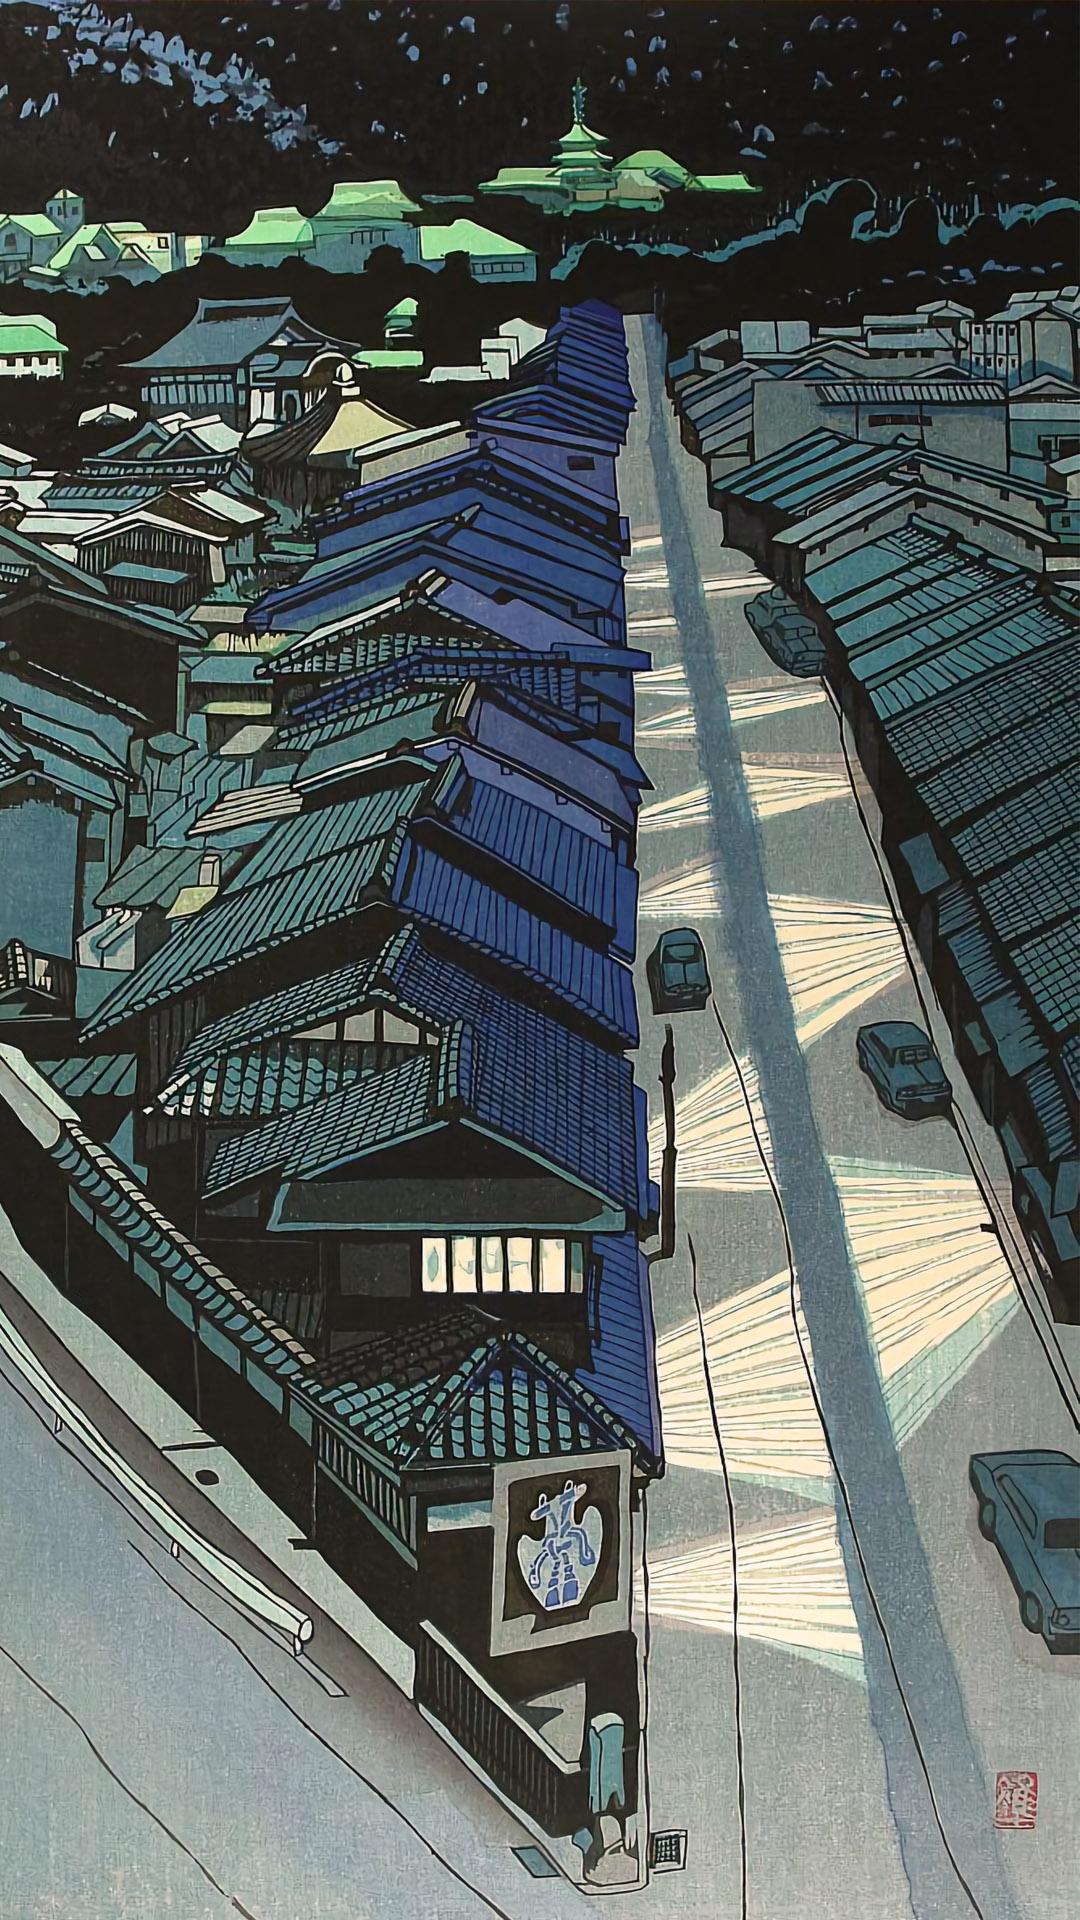 関野準一郎 京の夜 Sekino Junichiro - Kyo no yoru 1080x1920